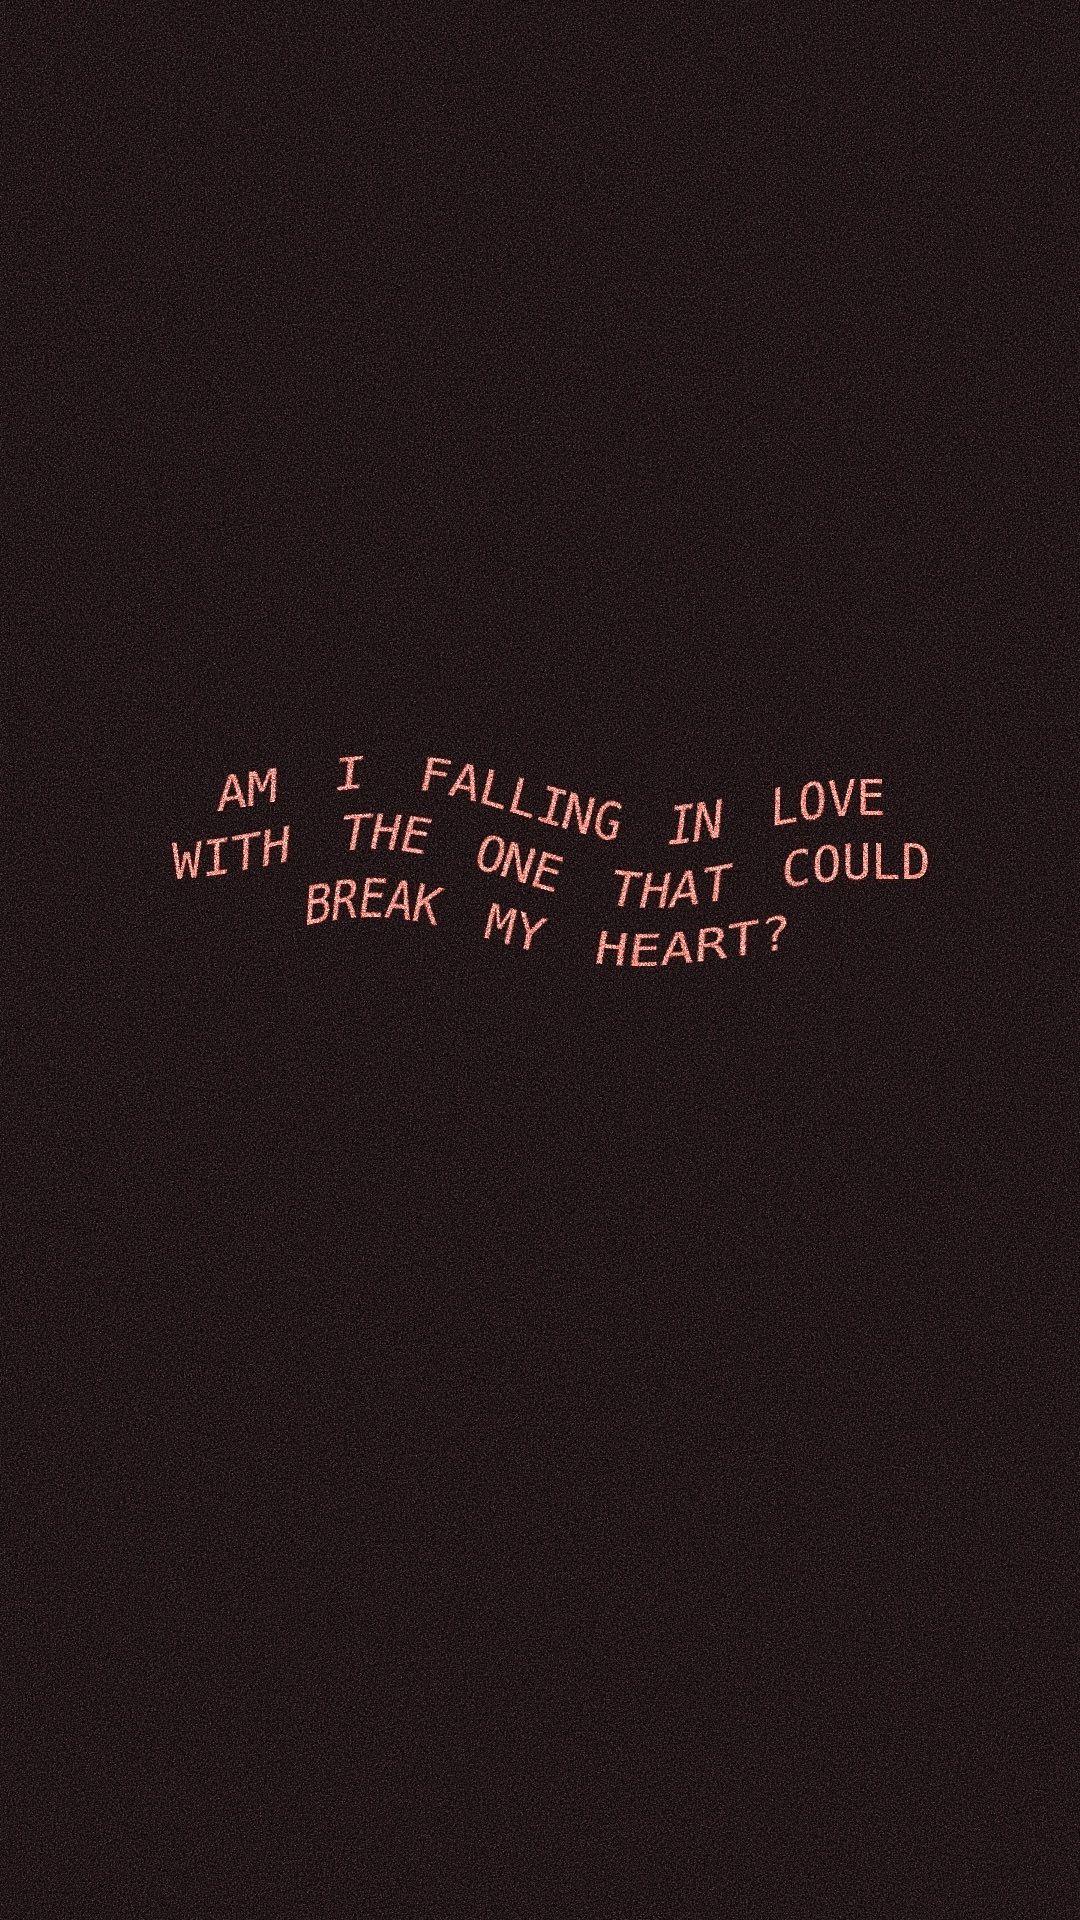 Dua Lipa Break My Heart Iphone Background Wallpaper Graphic My Heart Is Breaking Simple Love Quotes Broken Heart Wallpaper Broken hearted lock screen love quotes